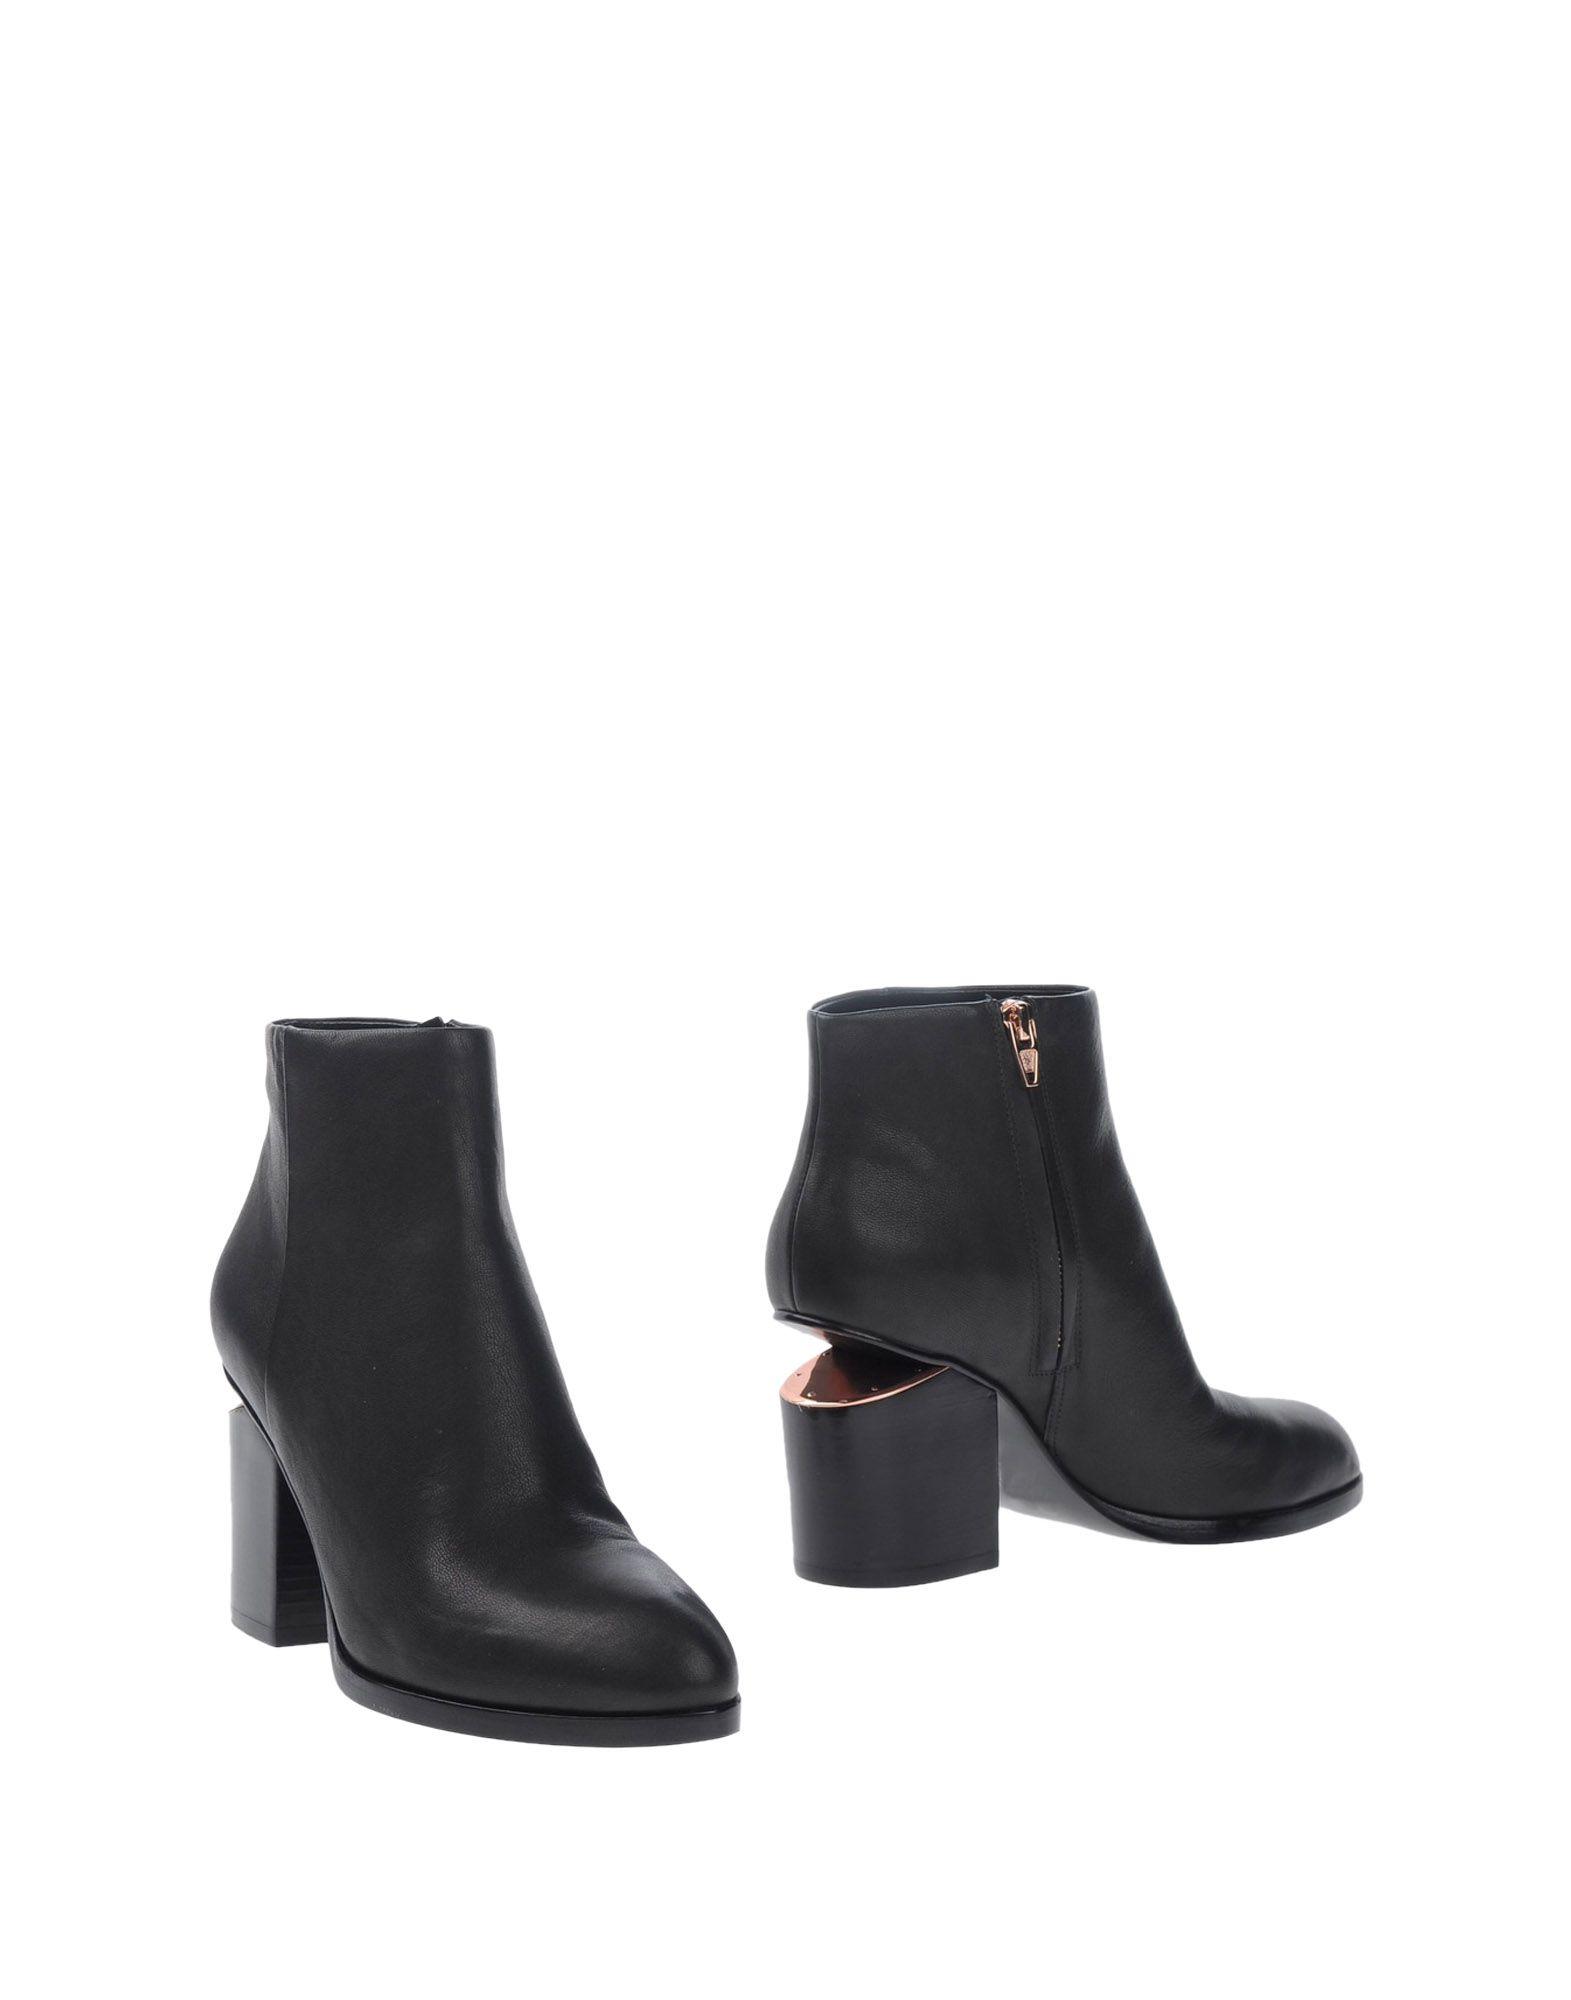 Alexander Wang Stiefelette Damen  11057134RWGünstige gut aussehende Schuhe